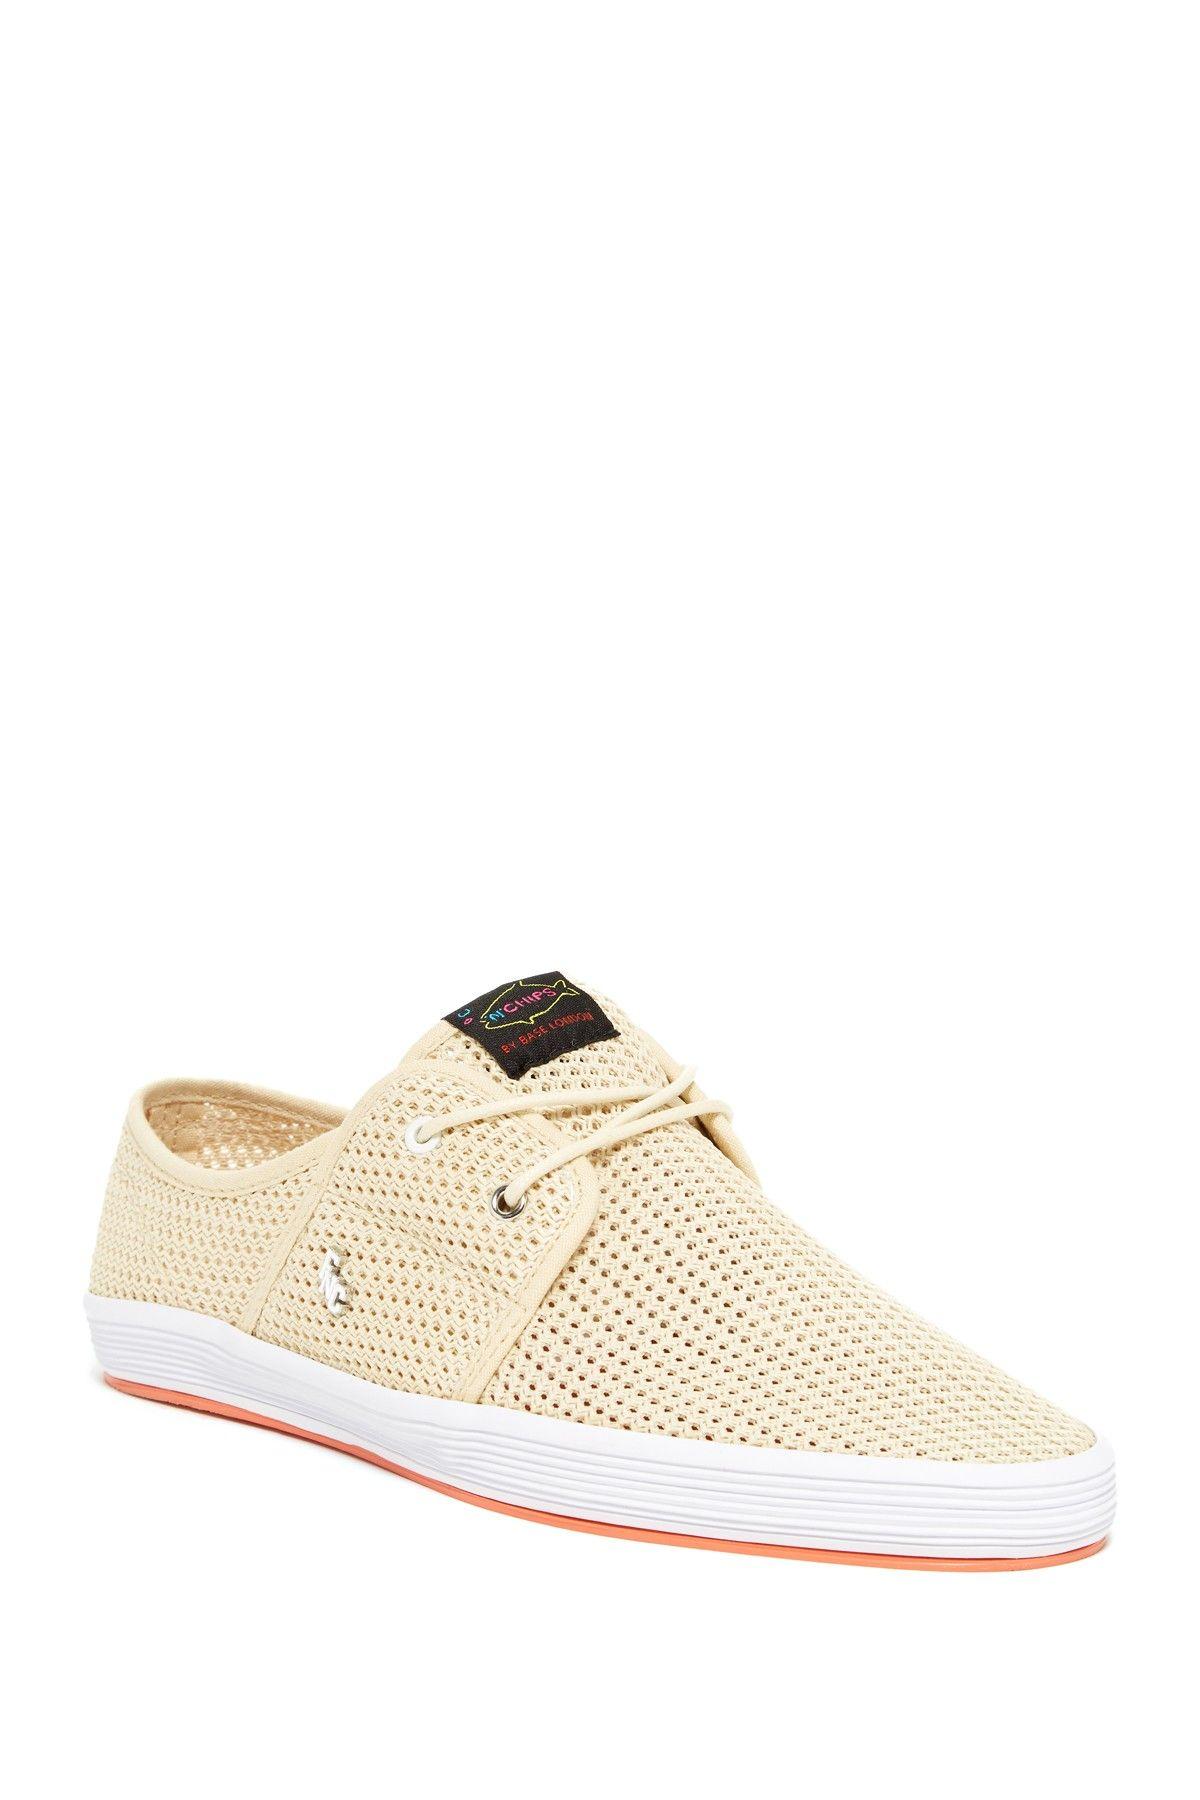 Spam 2 Mesh Sneaker